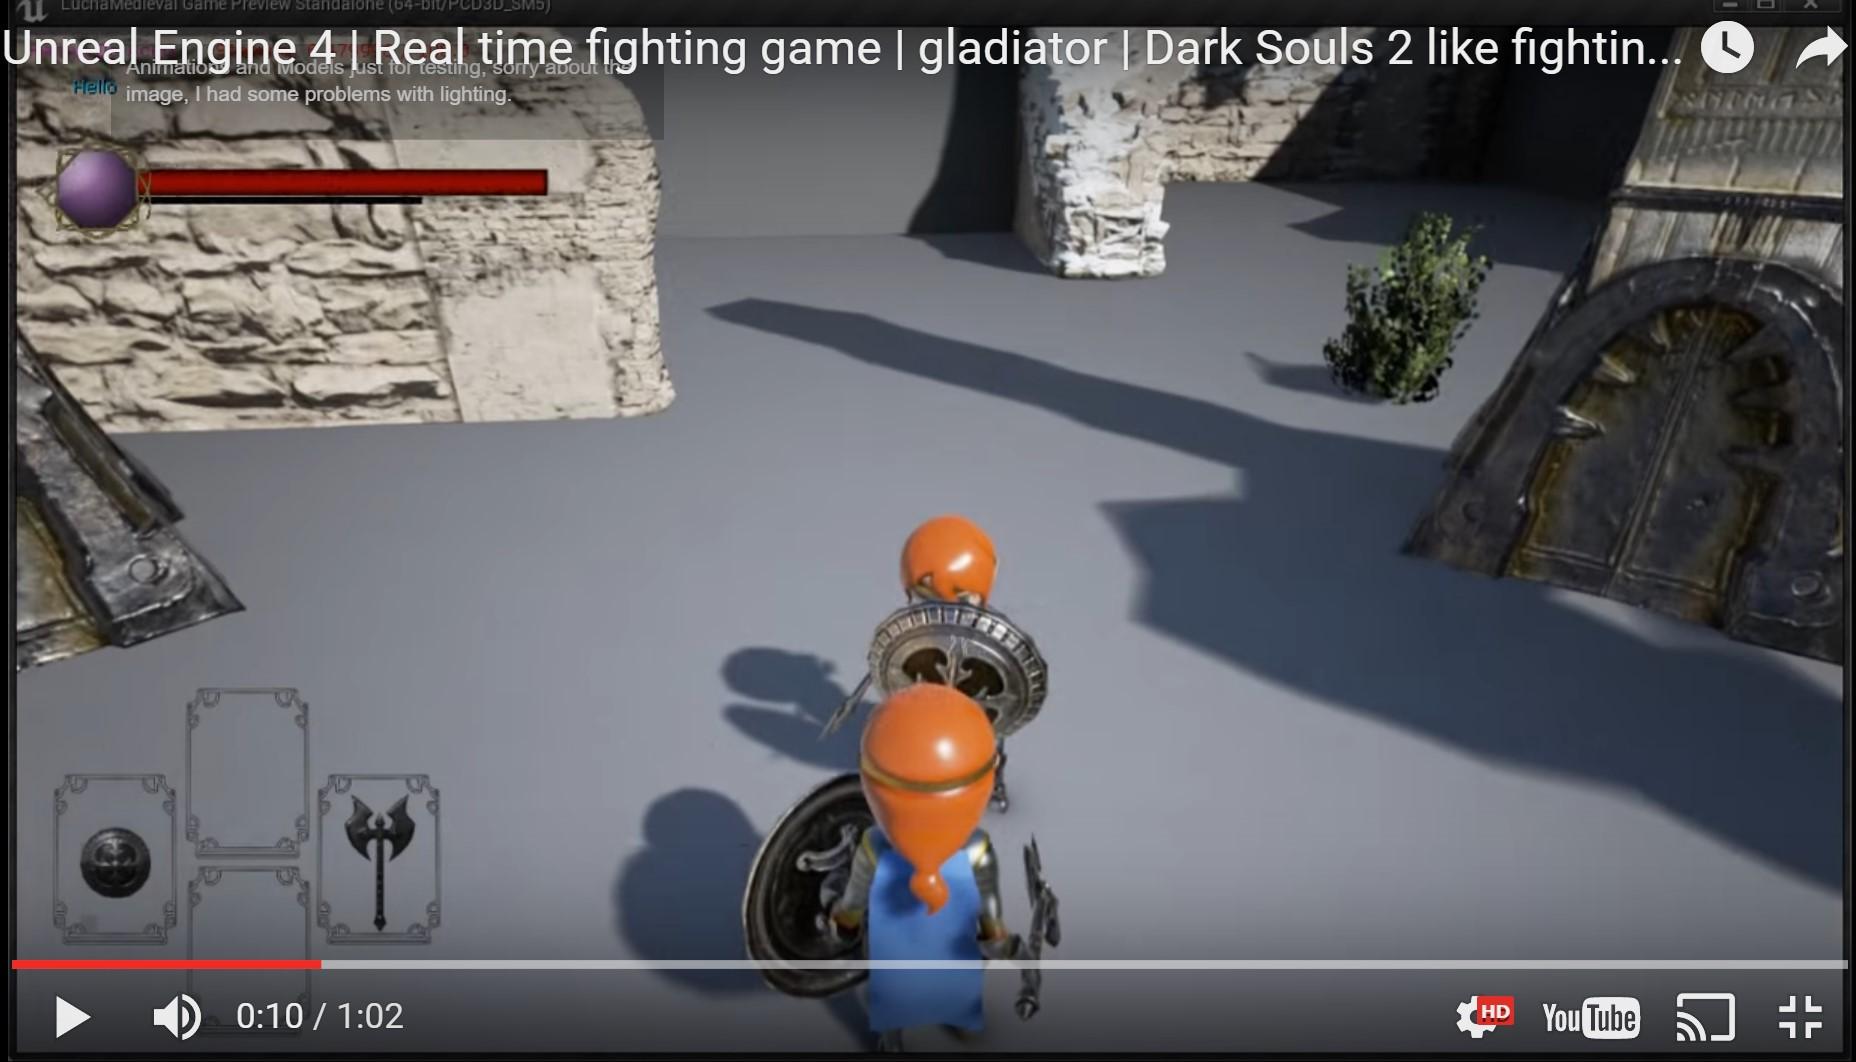 unreal engine fighting system gladiators